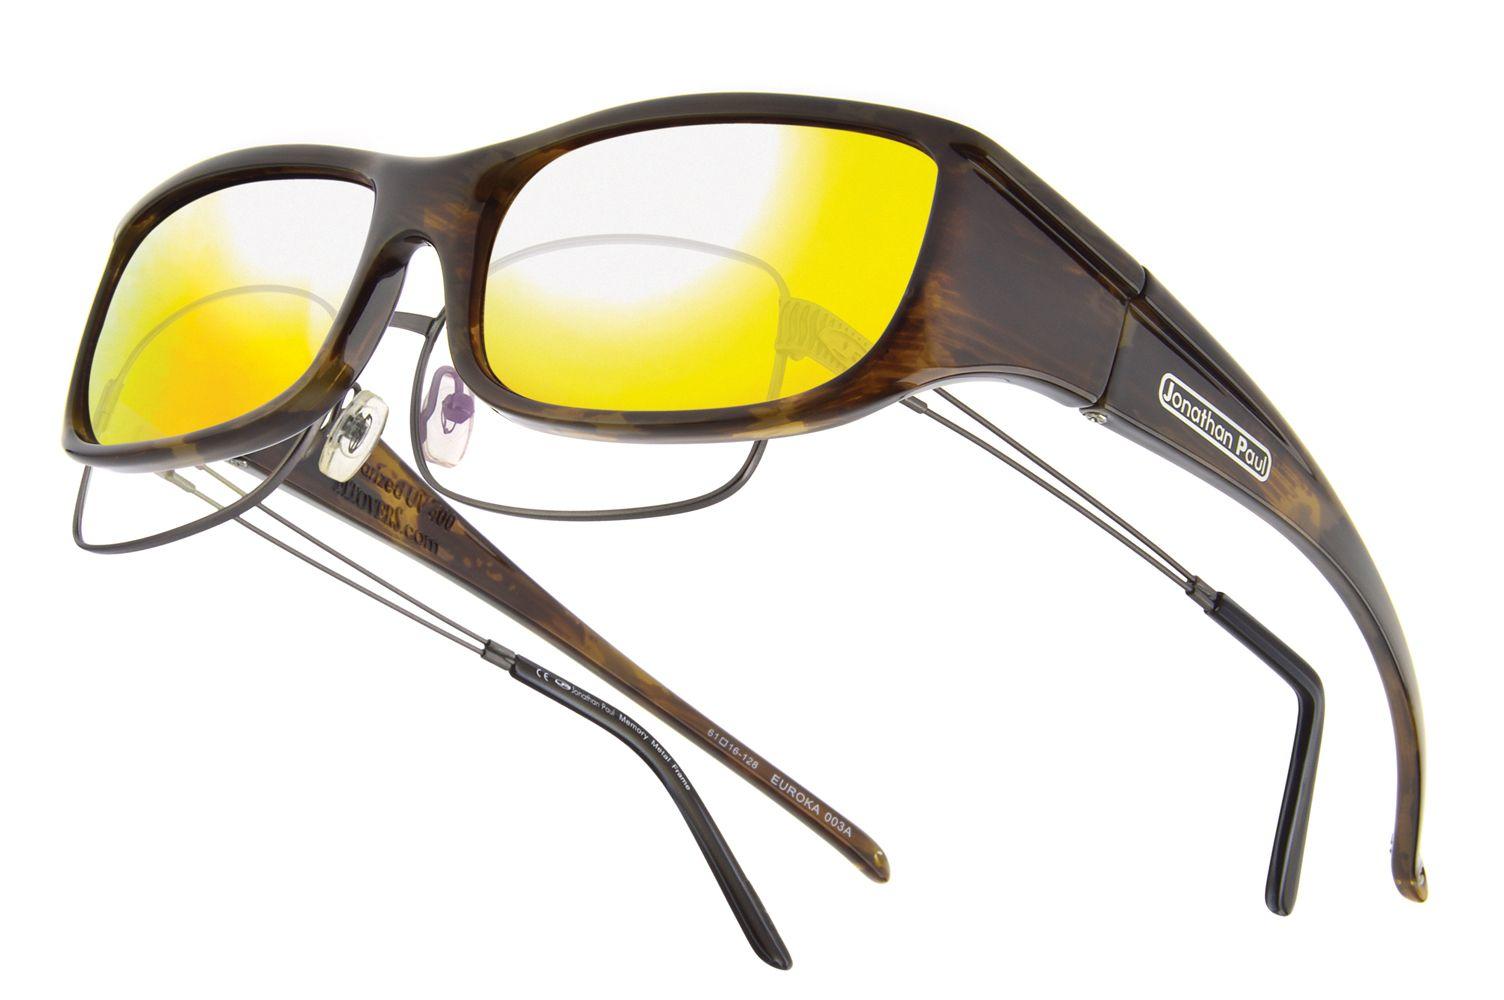 226ee53517 How Fitovers™ Sunglasses Compare to Prescription Sunglasses